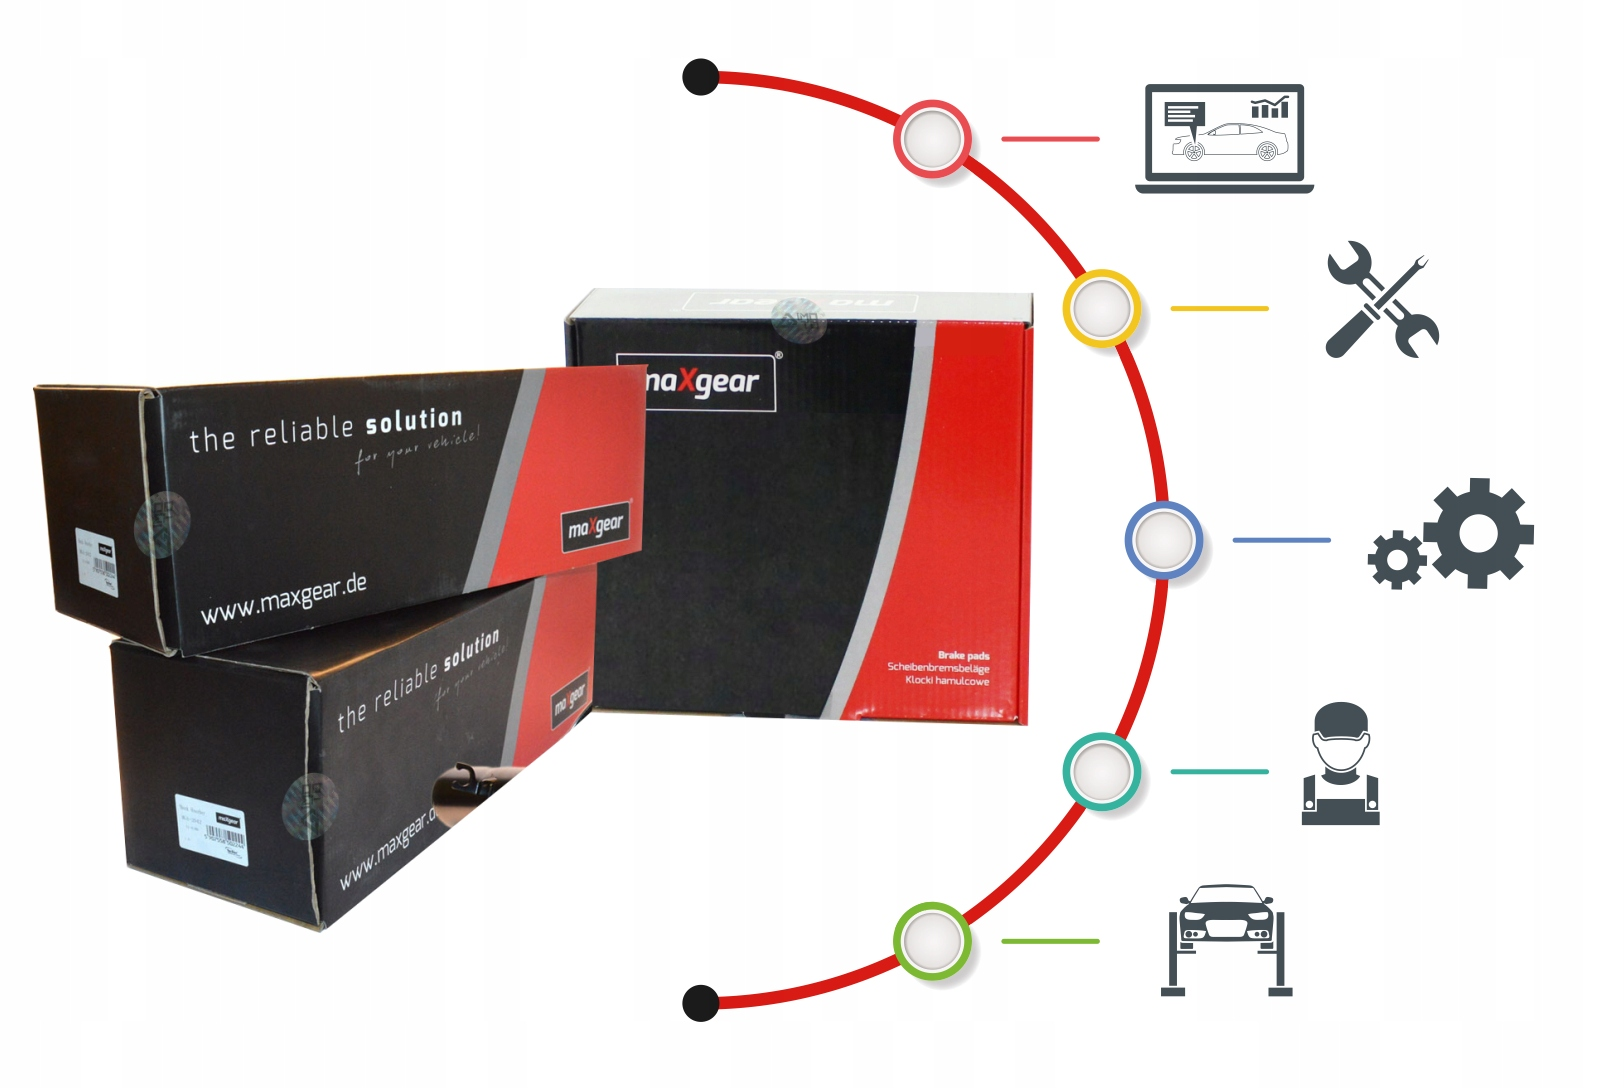 vauxhall sintra wiring diagram belt tensioner opel sintra 3 0 i 24v xdalys lt  belt tensioner opel sintra 3 0 i 24v